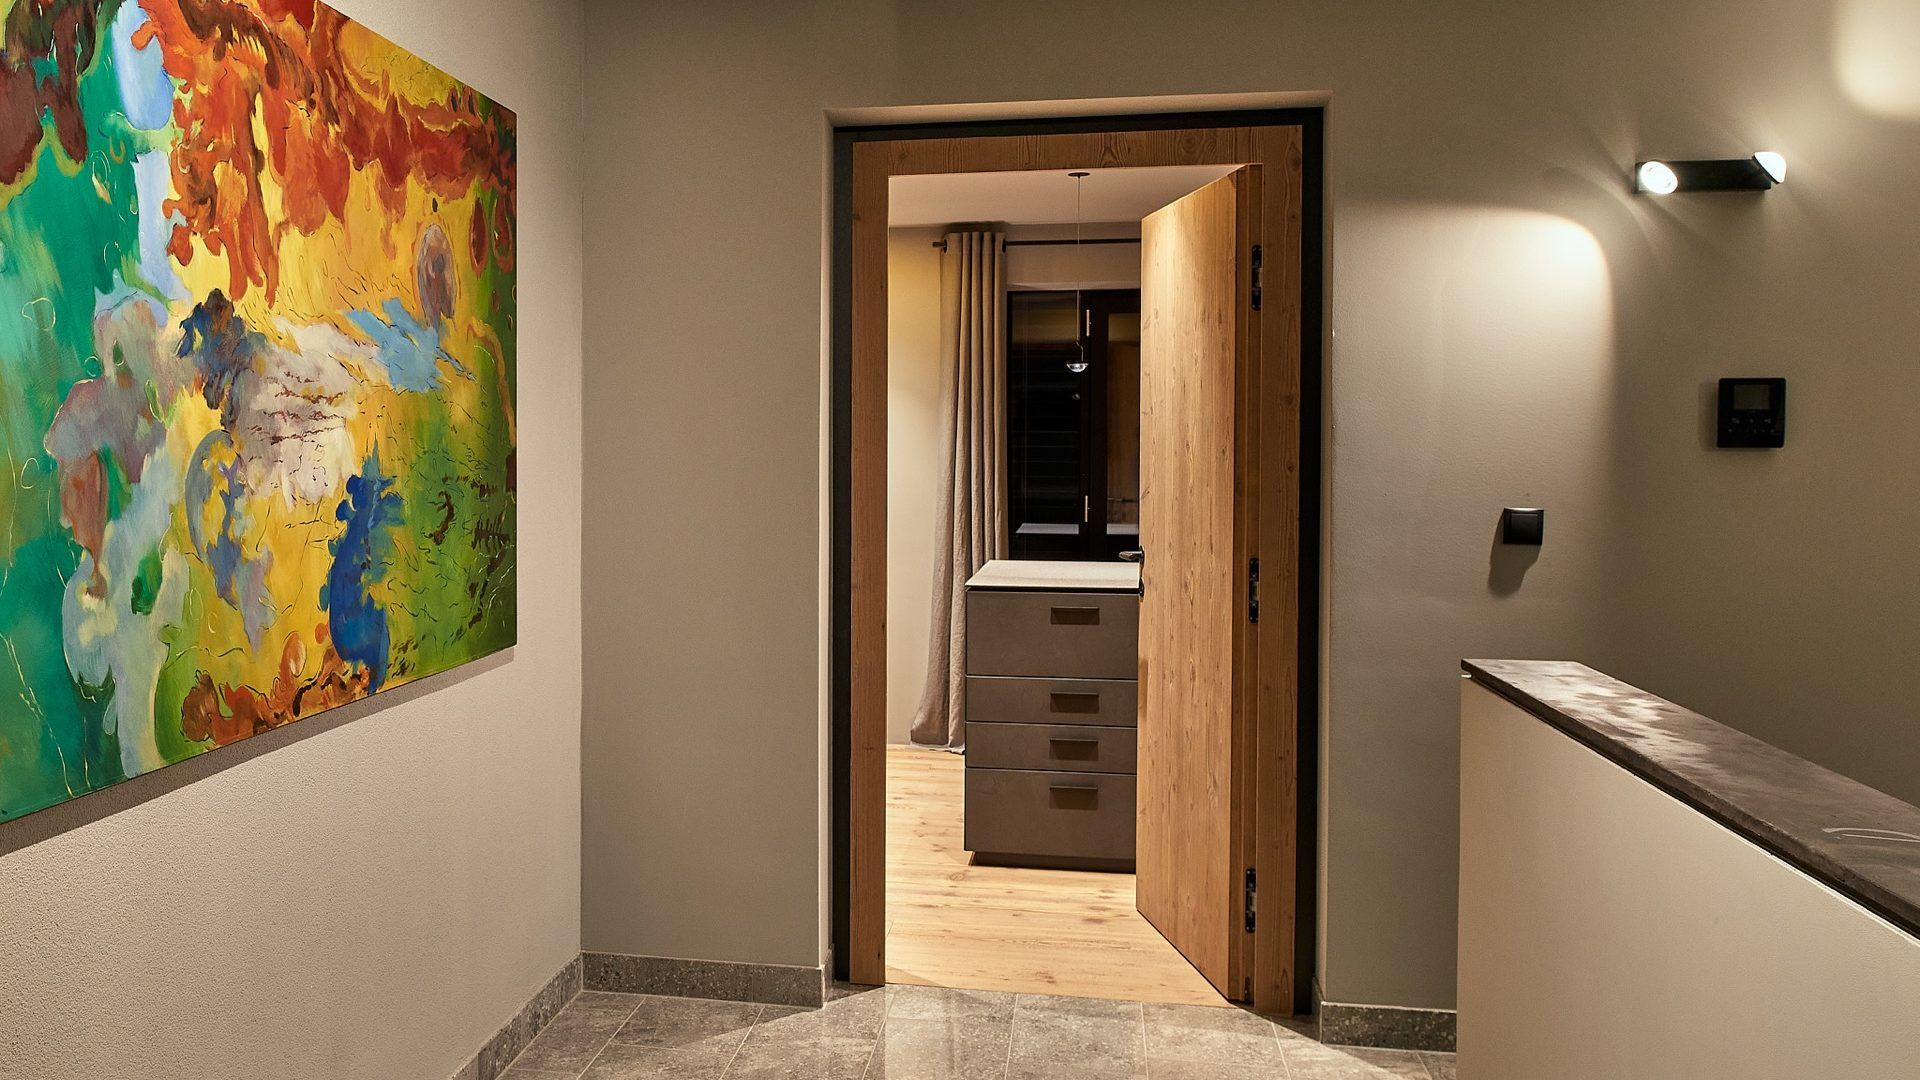 Lichtplanung mit LED-Strahler, privates Treppenhaus, Salzburg